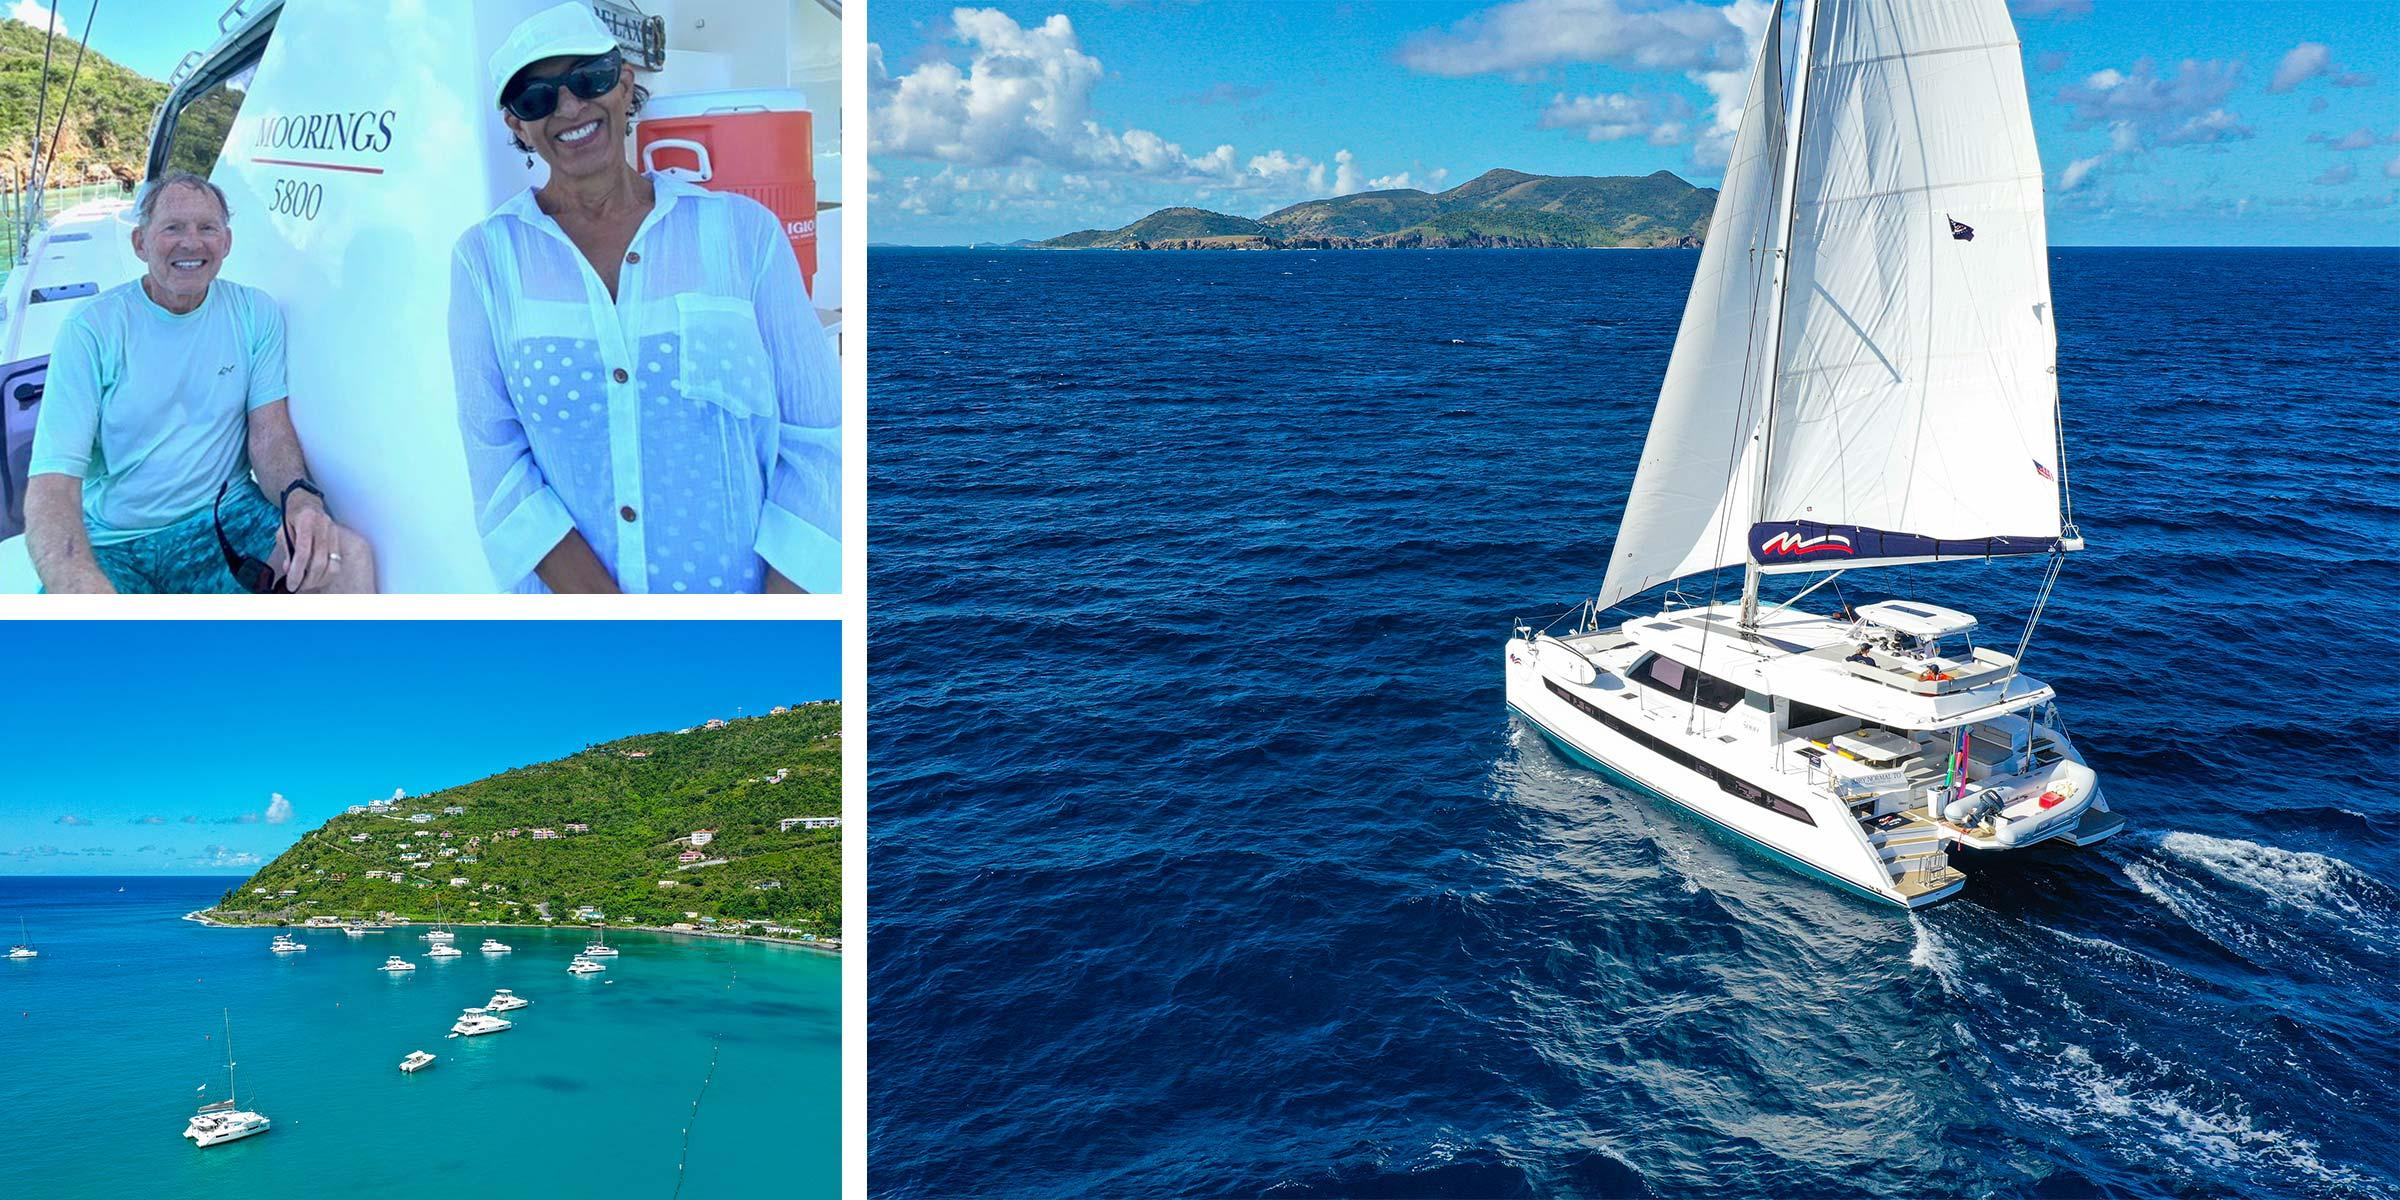 Tony Rainold and wife Yolanda on a Moorings 5800 - Moorings 5000 under sail in the BVI